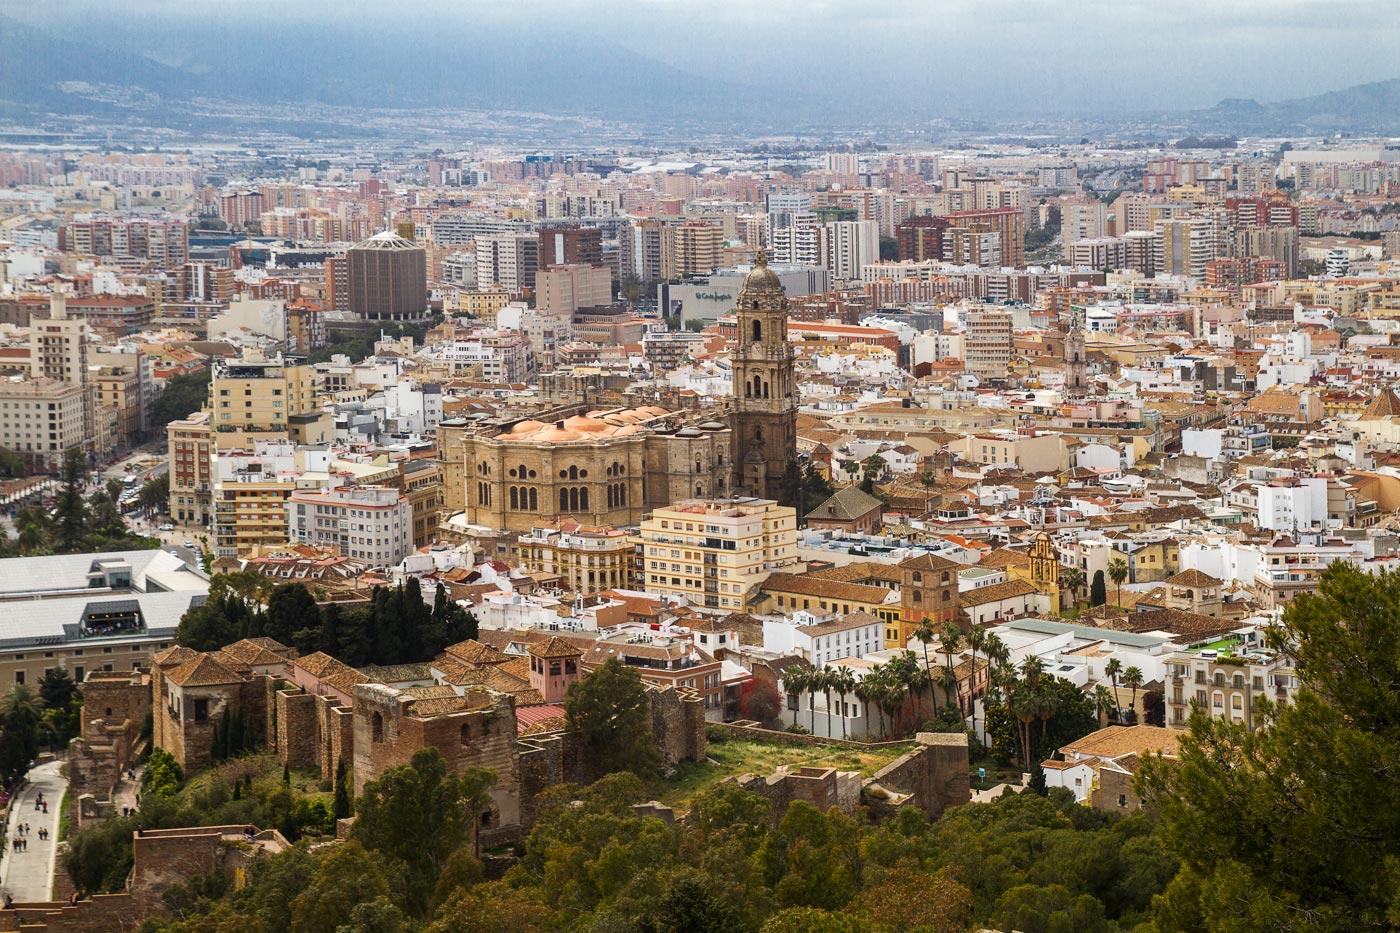 Андалусия, вид на Малагу с крепости Хибральфаро